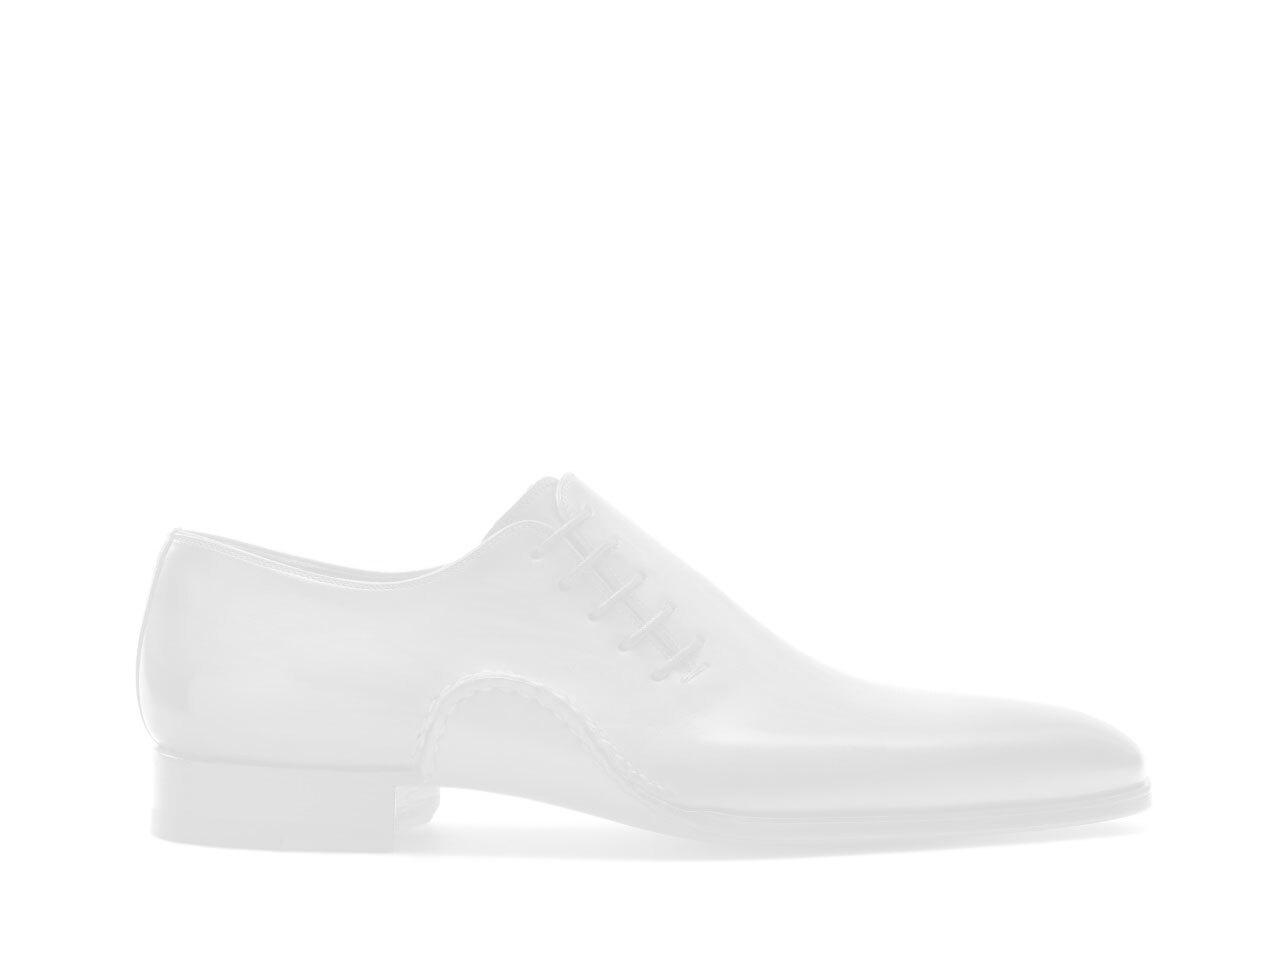 Light brown leather wholecut shoes for men - Magnanni